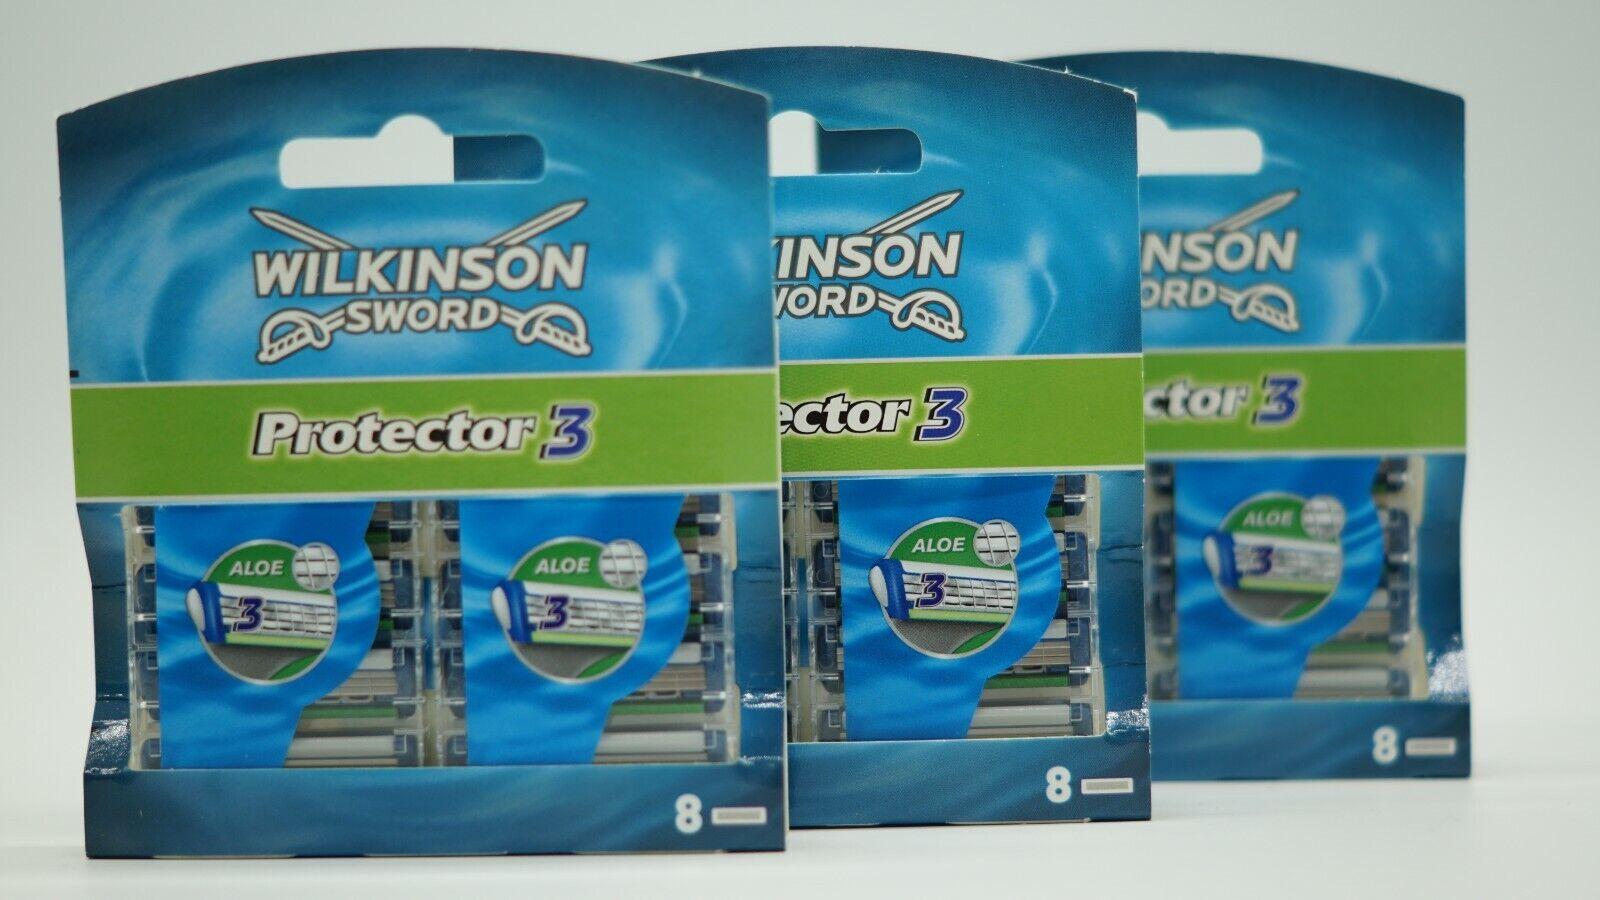 Wilkinson Sword Protector 3 Rasierklingen 24 er - NEU - OVP - für Männer 3 x 8er